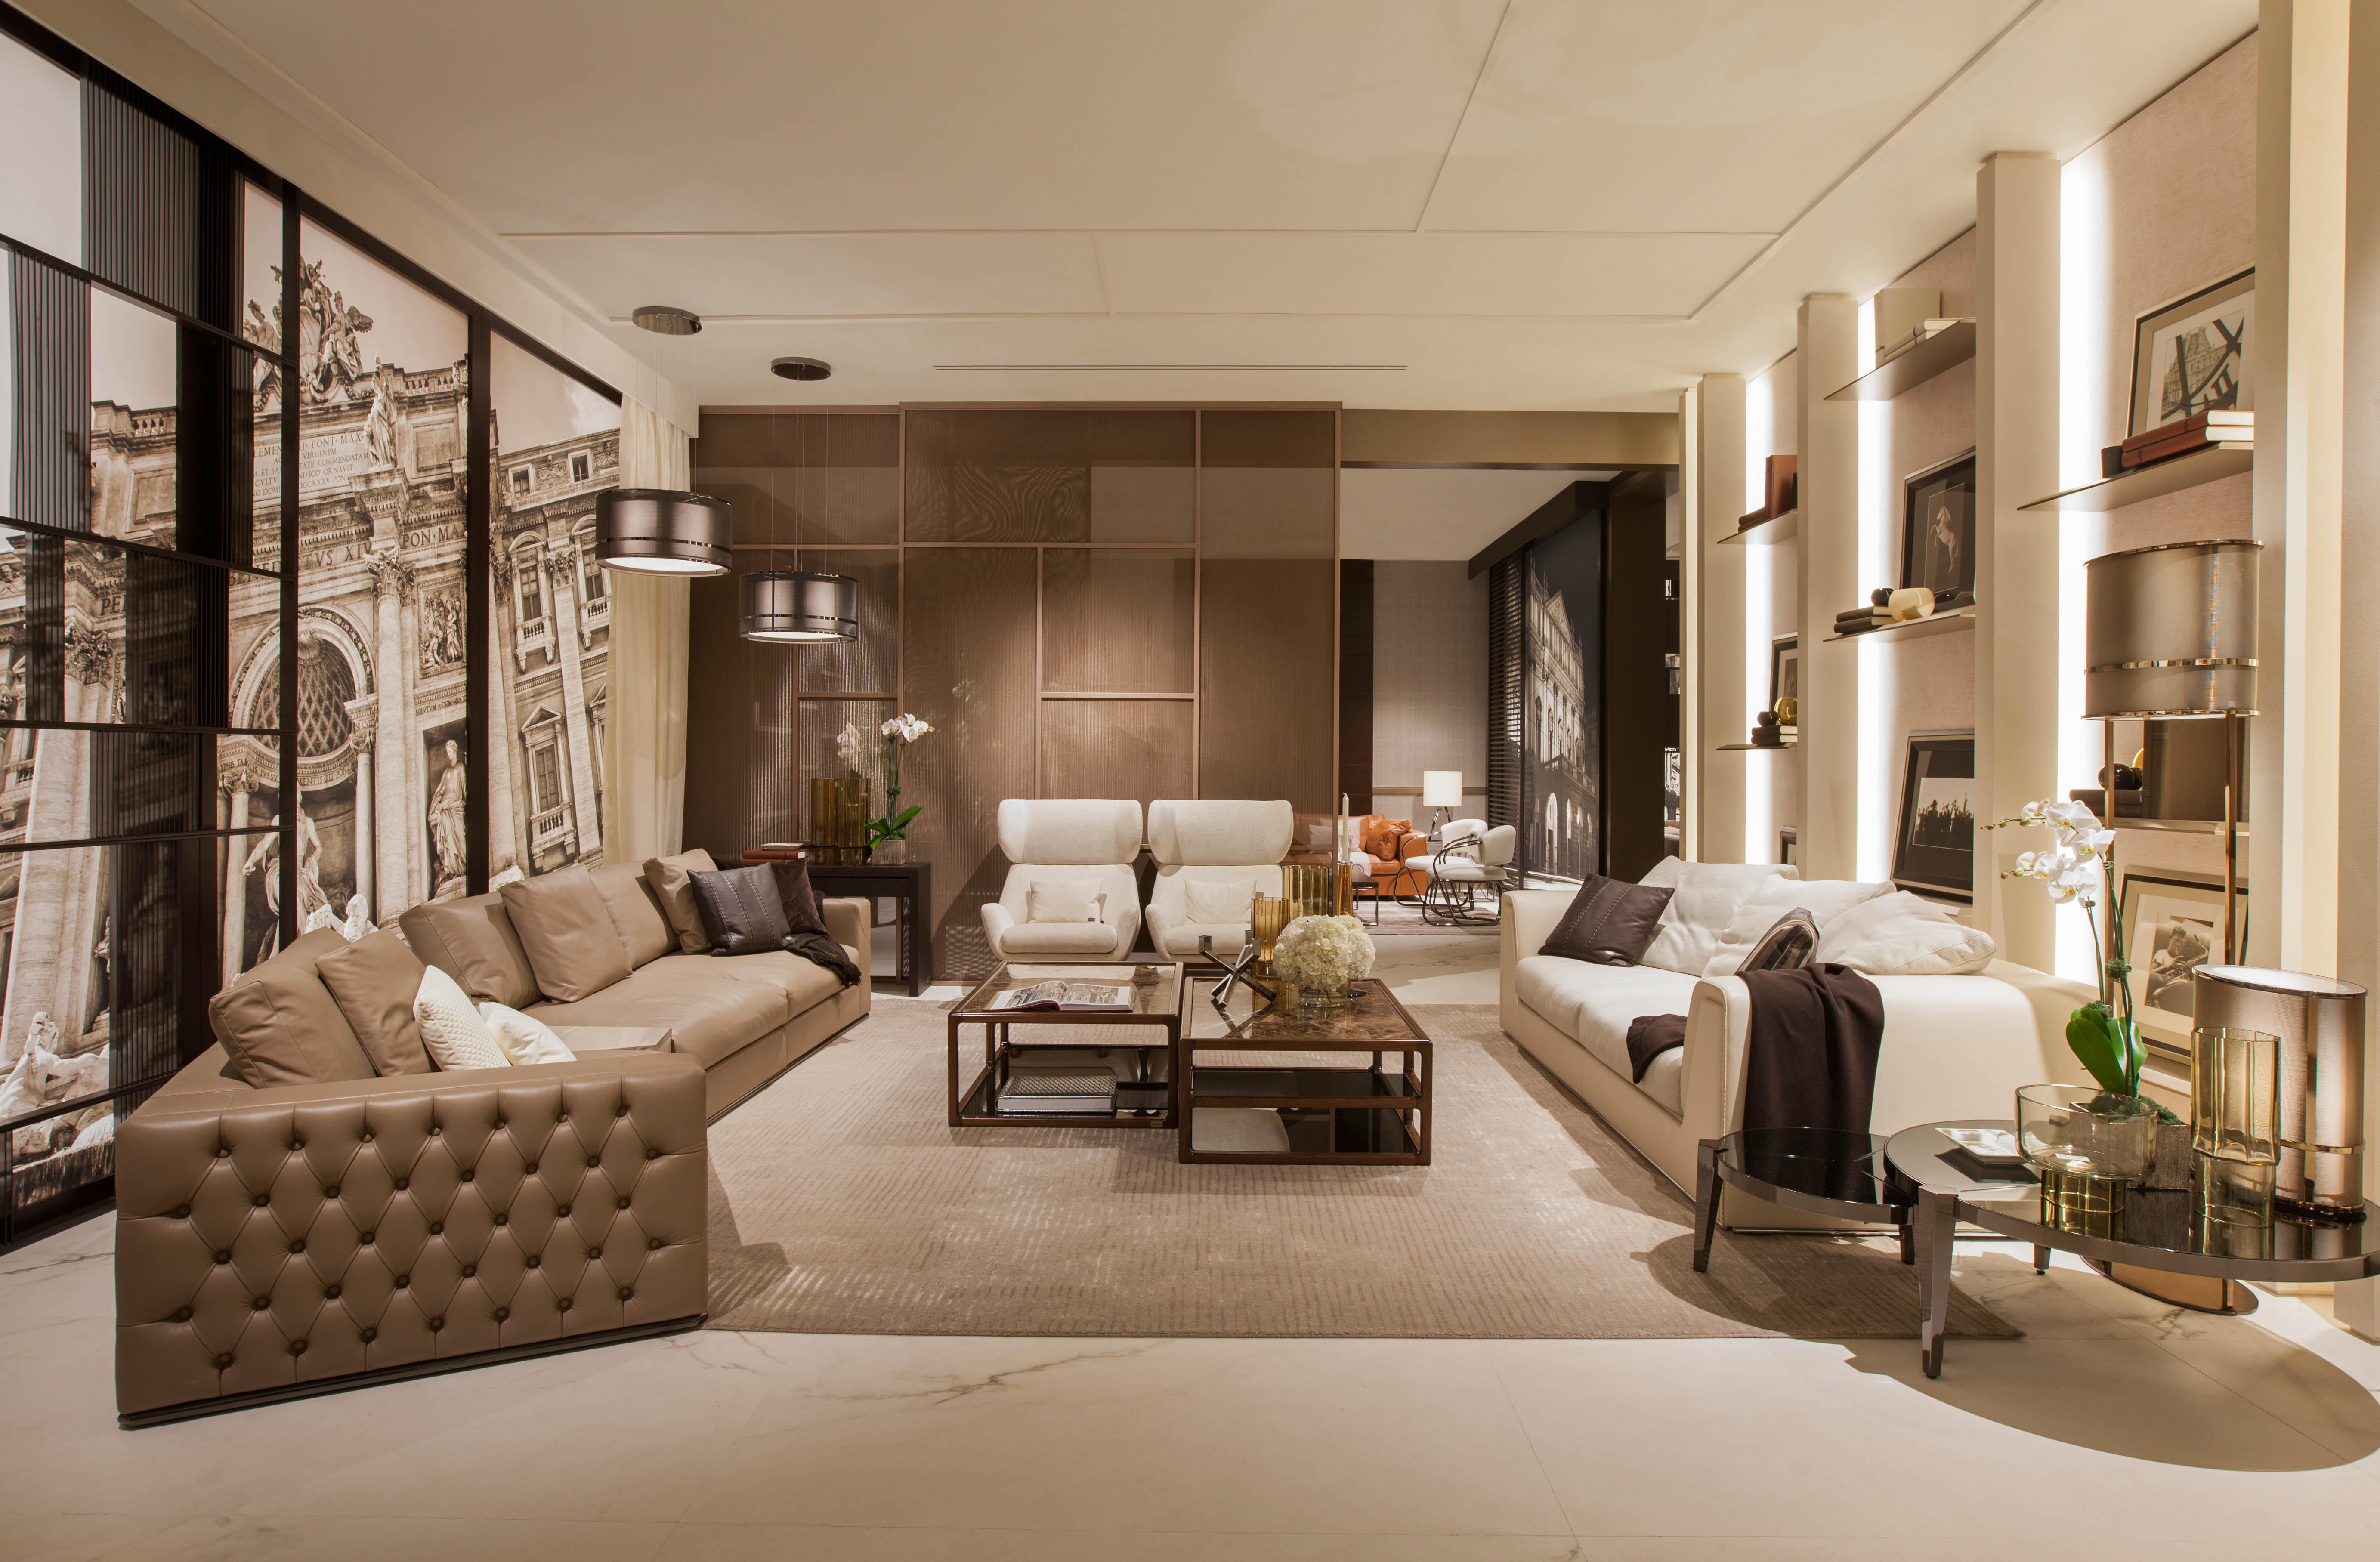 Fendi Casas New LA Flagship Is Ultra Luxury At Its Finest